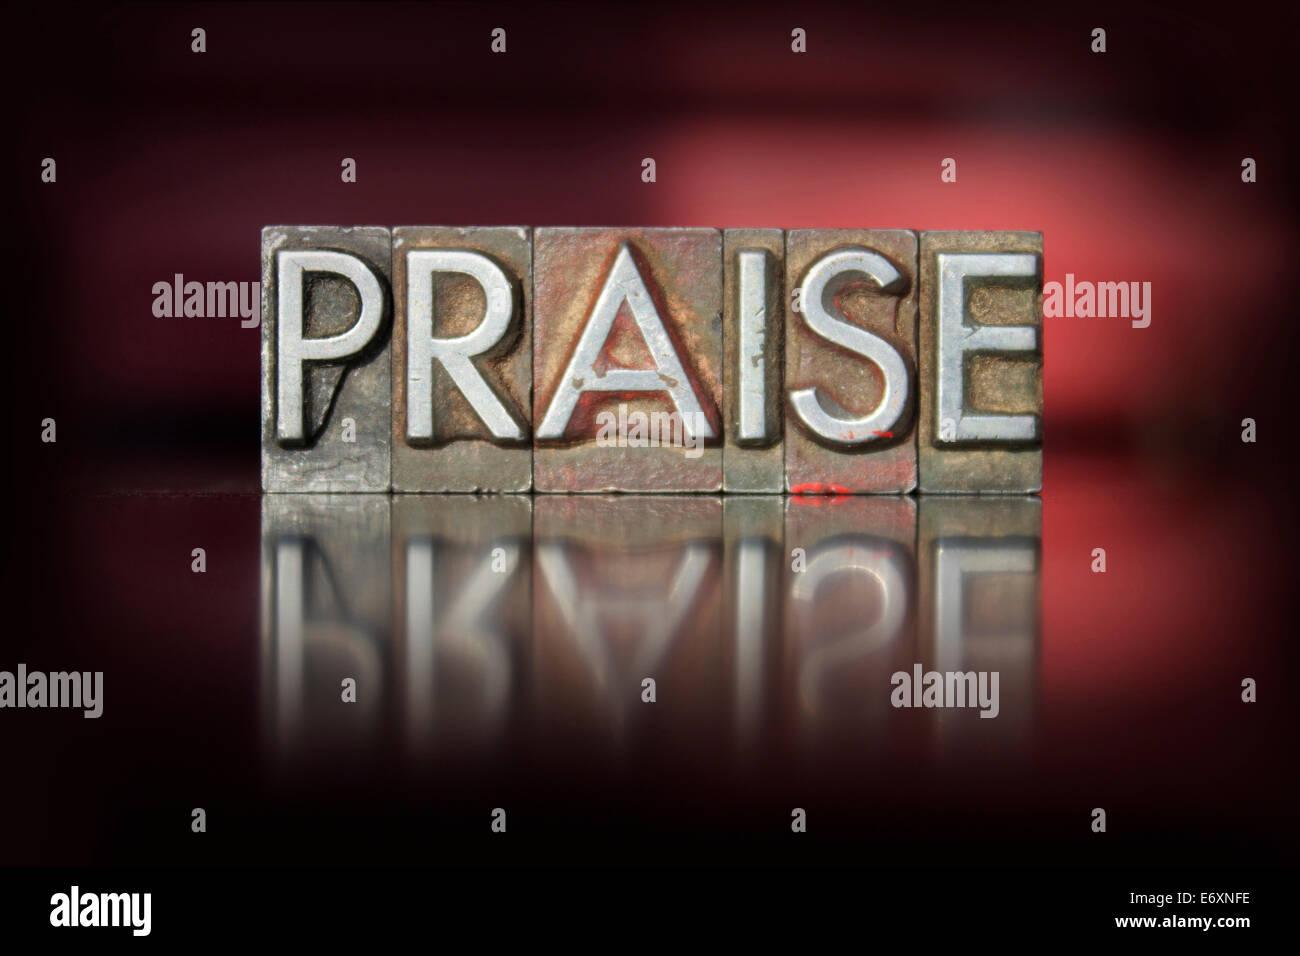 The word Praise written in vintage letterpress type - Stock Image